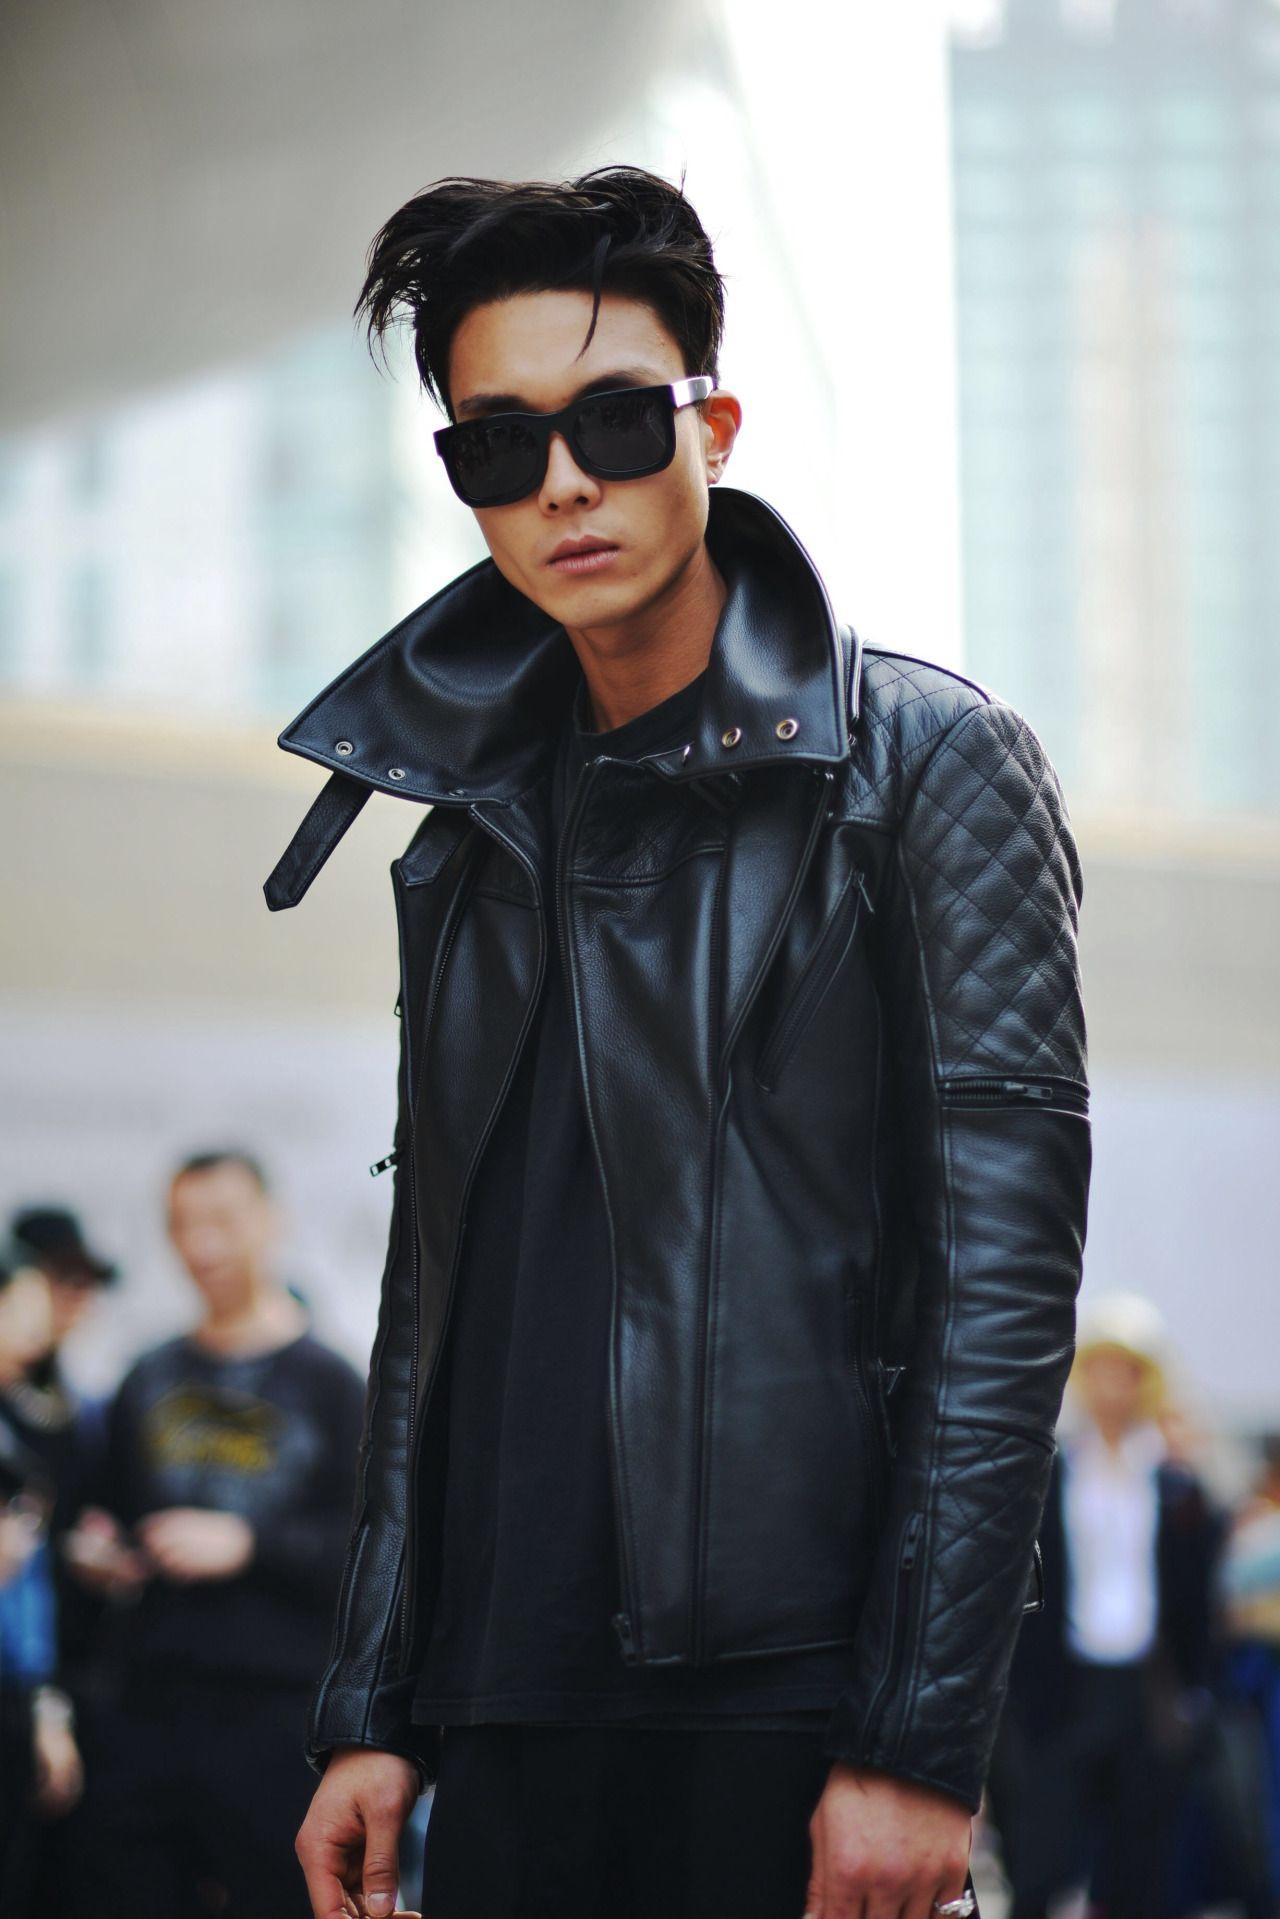 Street style: Kim Do Jin at Seoul Fashion Week Fall 2015 shot by Jeon Seung Ho